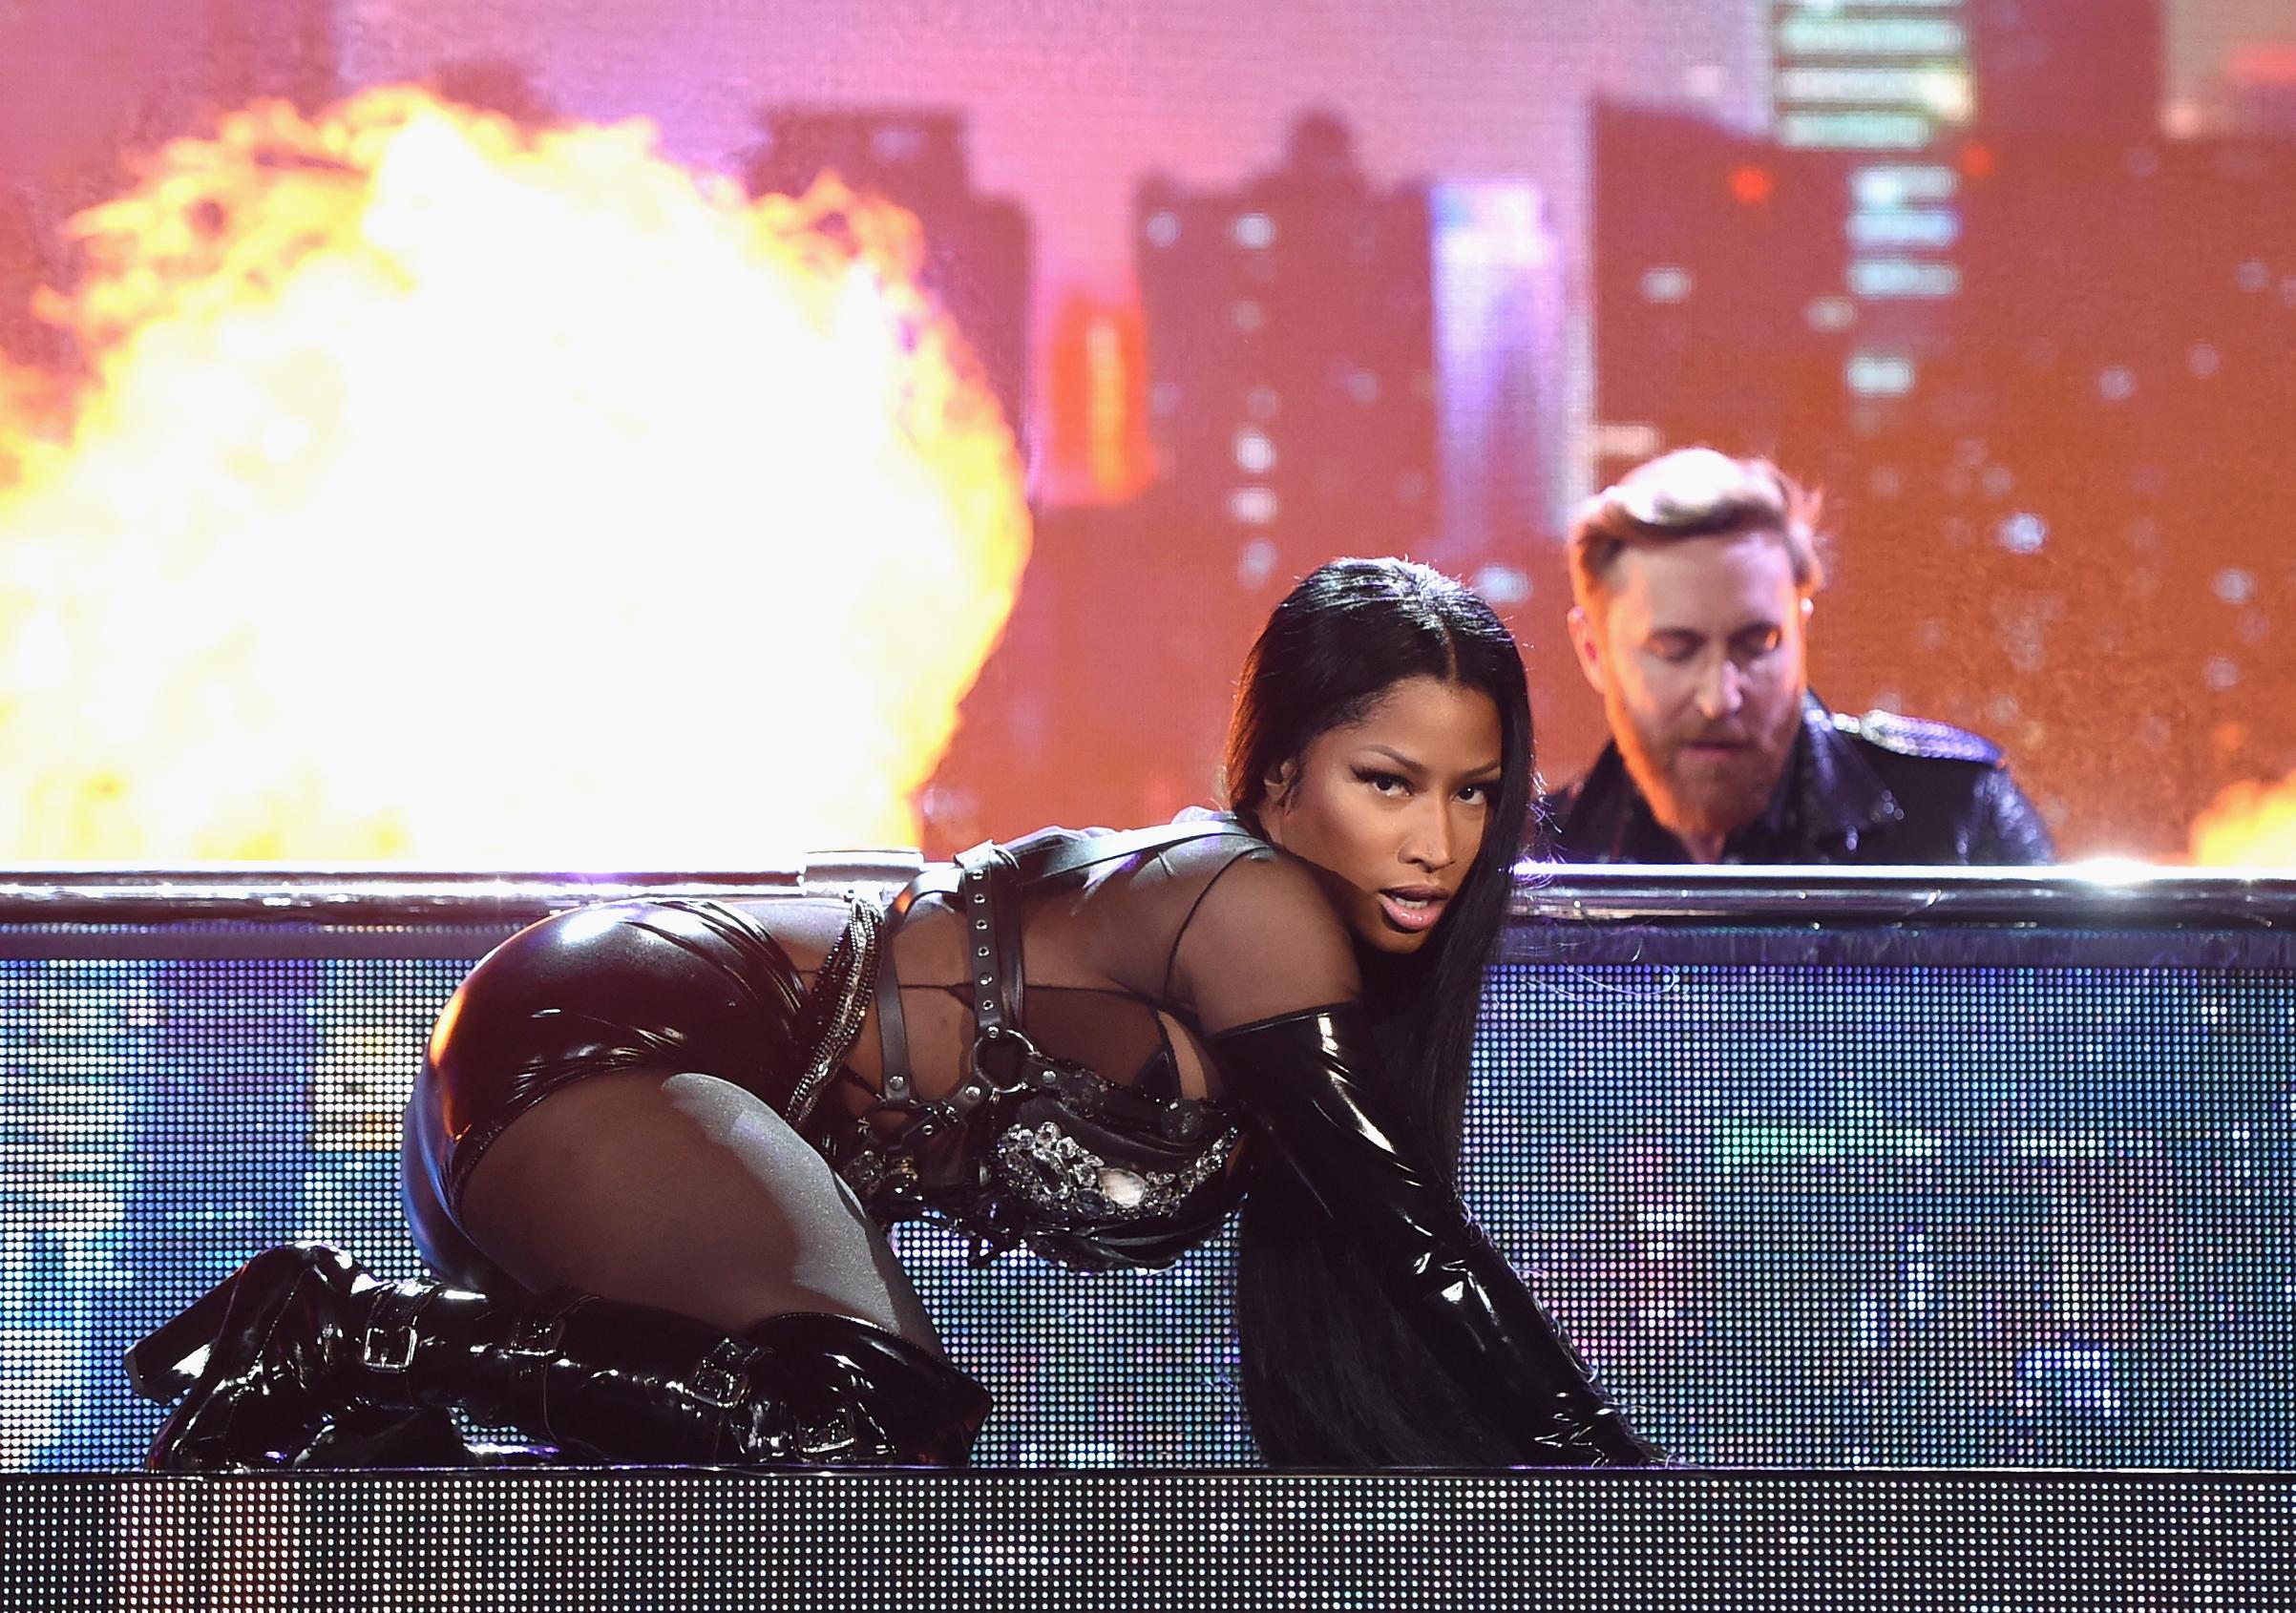 Nicki Minaj Opens BBMAs 2017 With Over-the-Top Medley: Watch